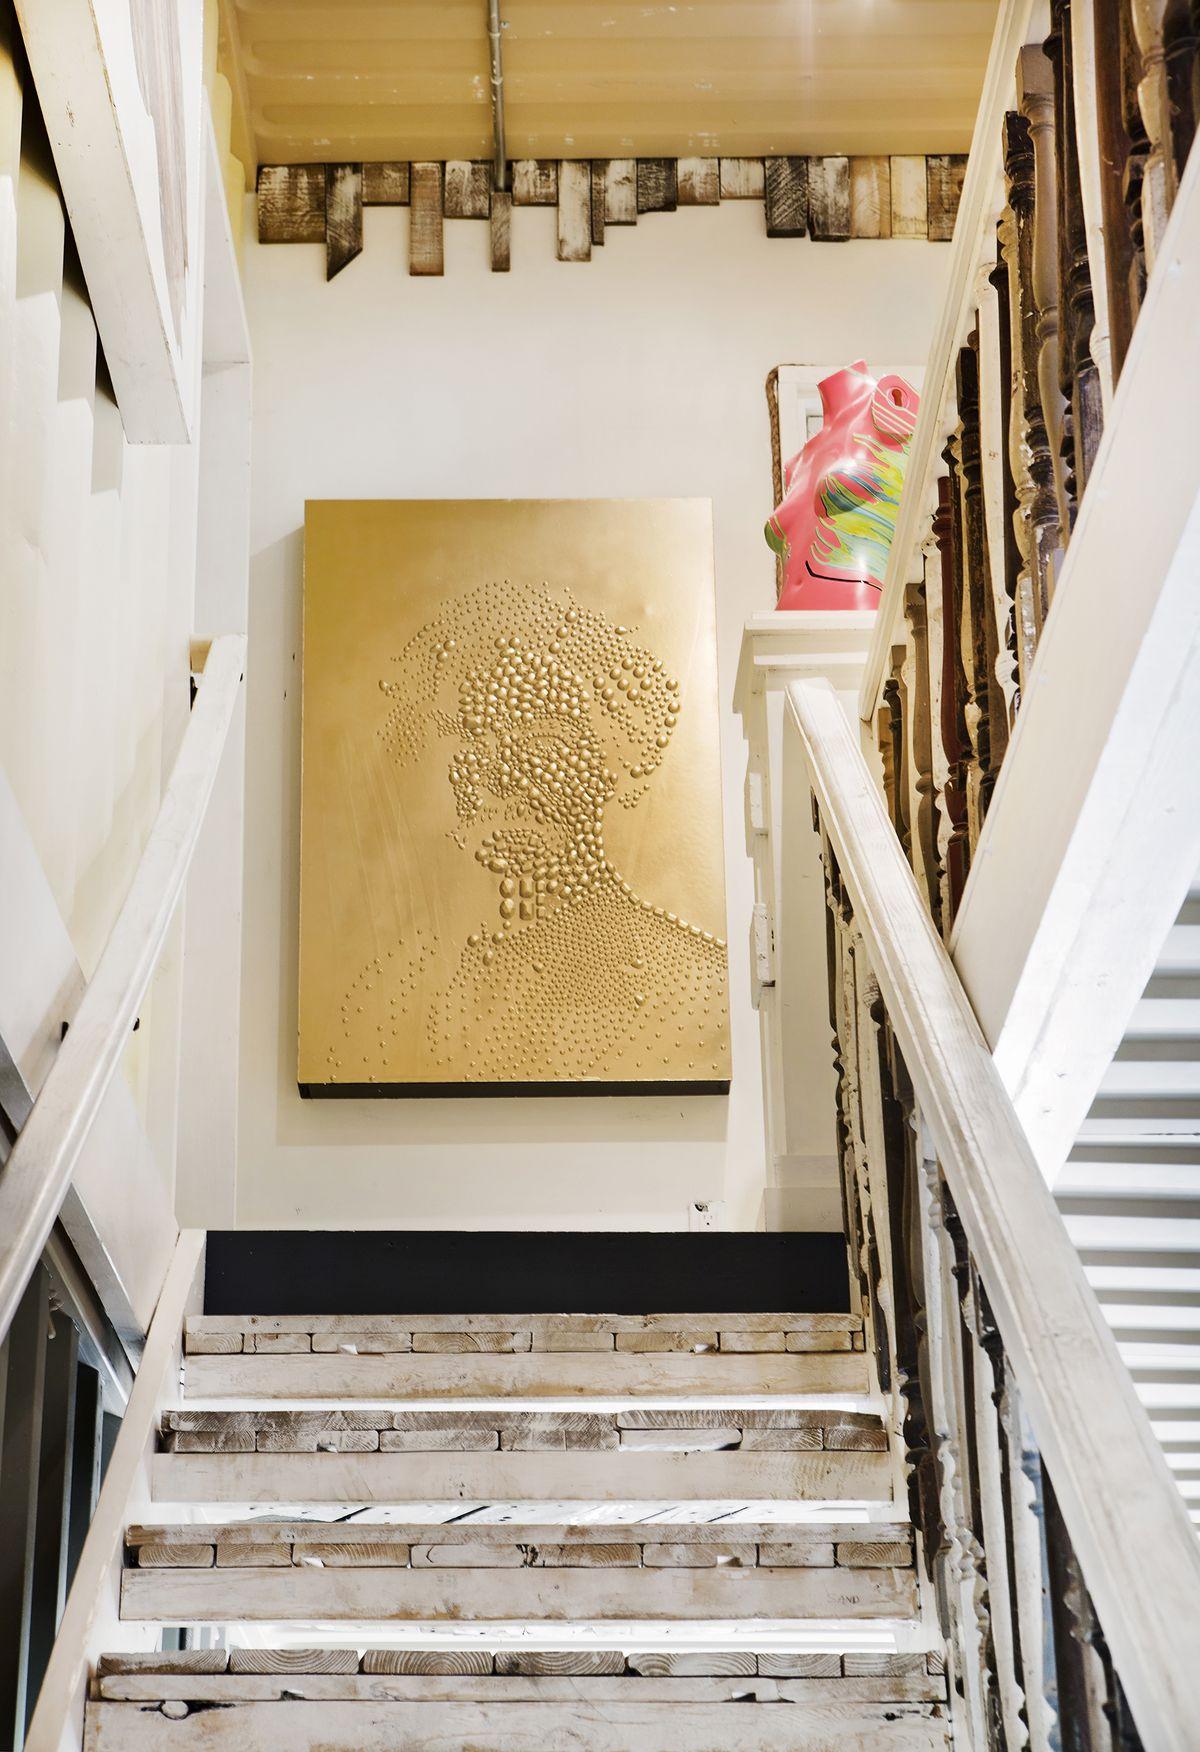 Diy renovation vs hiring pros how to decide curbed for Mutuo casa prefabbricata